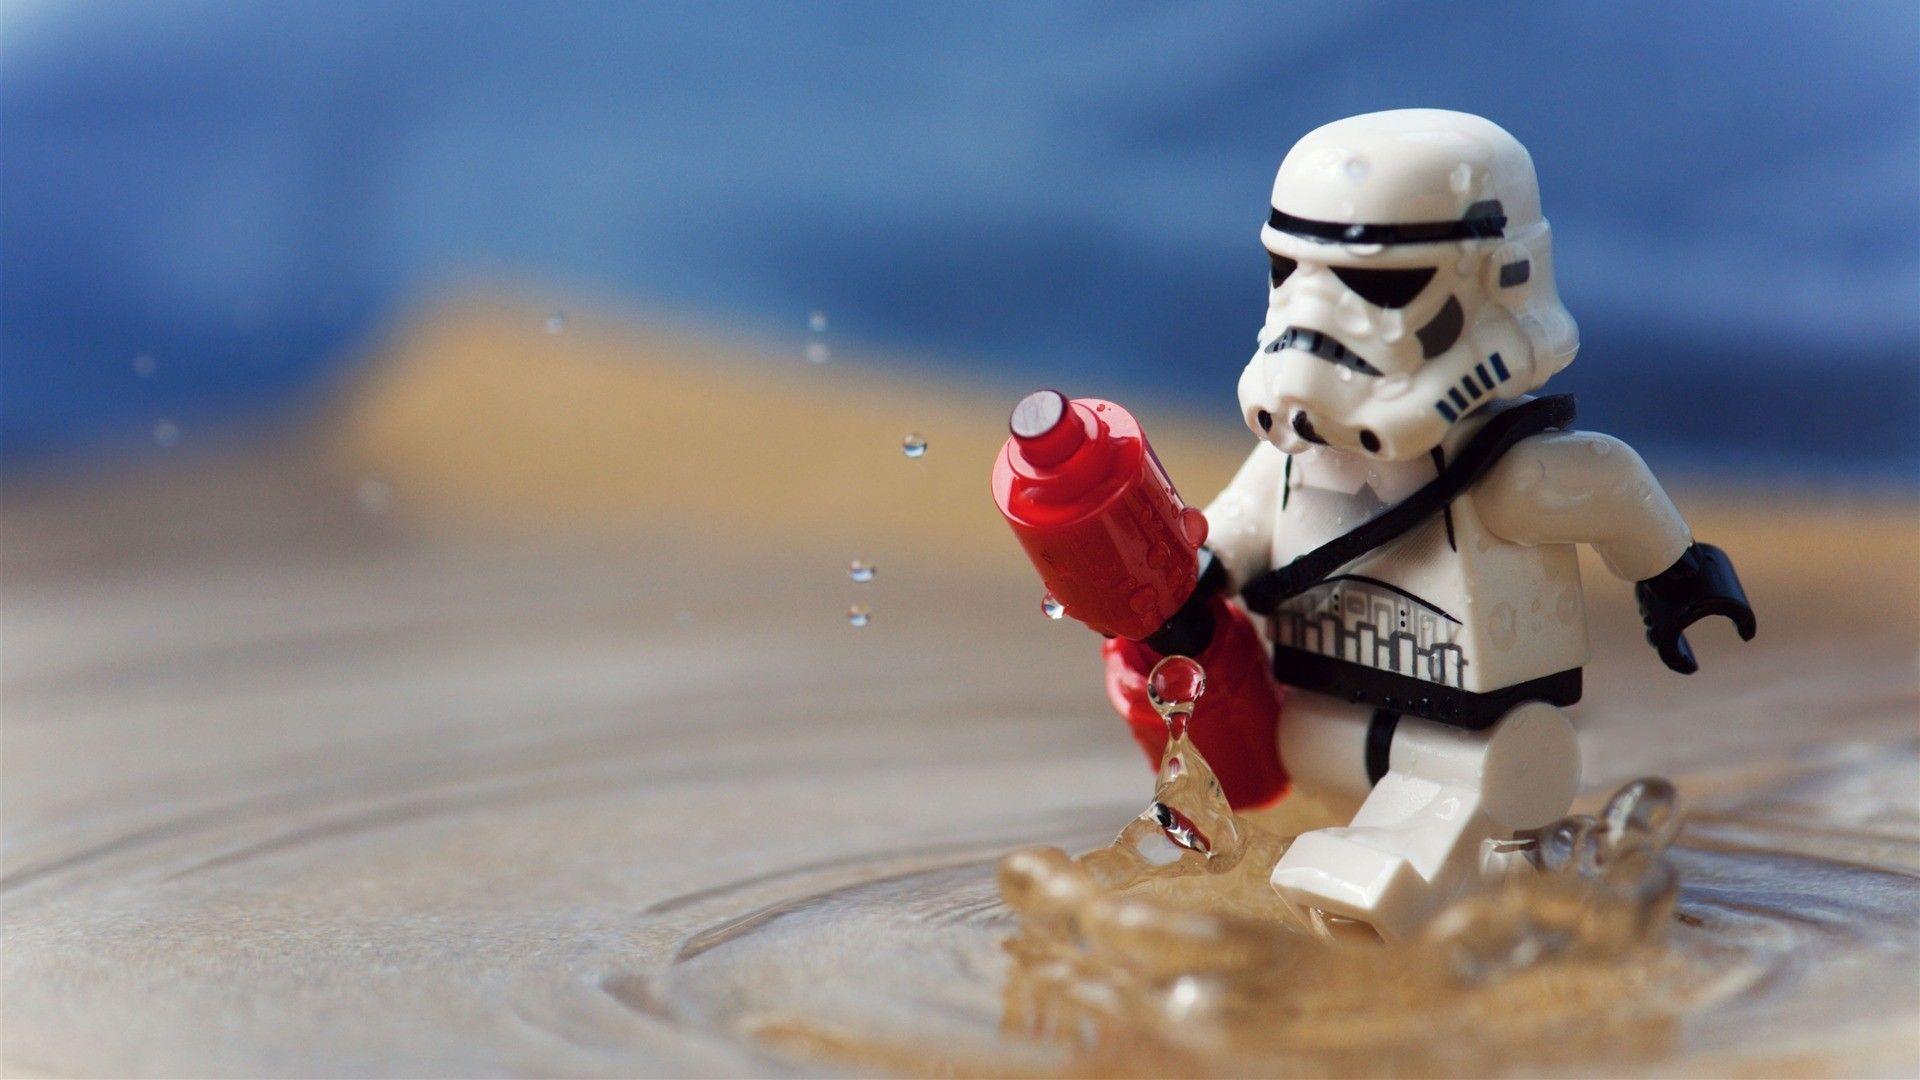 Lego storm troopers wallpaper | 1920x1080 | #25162